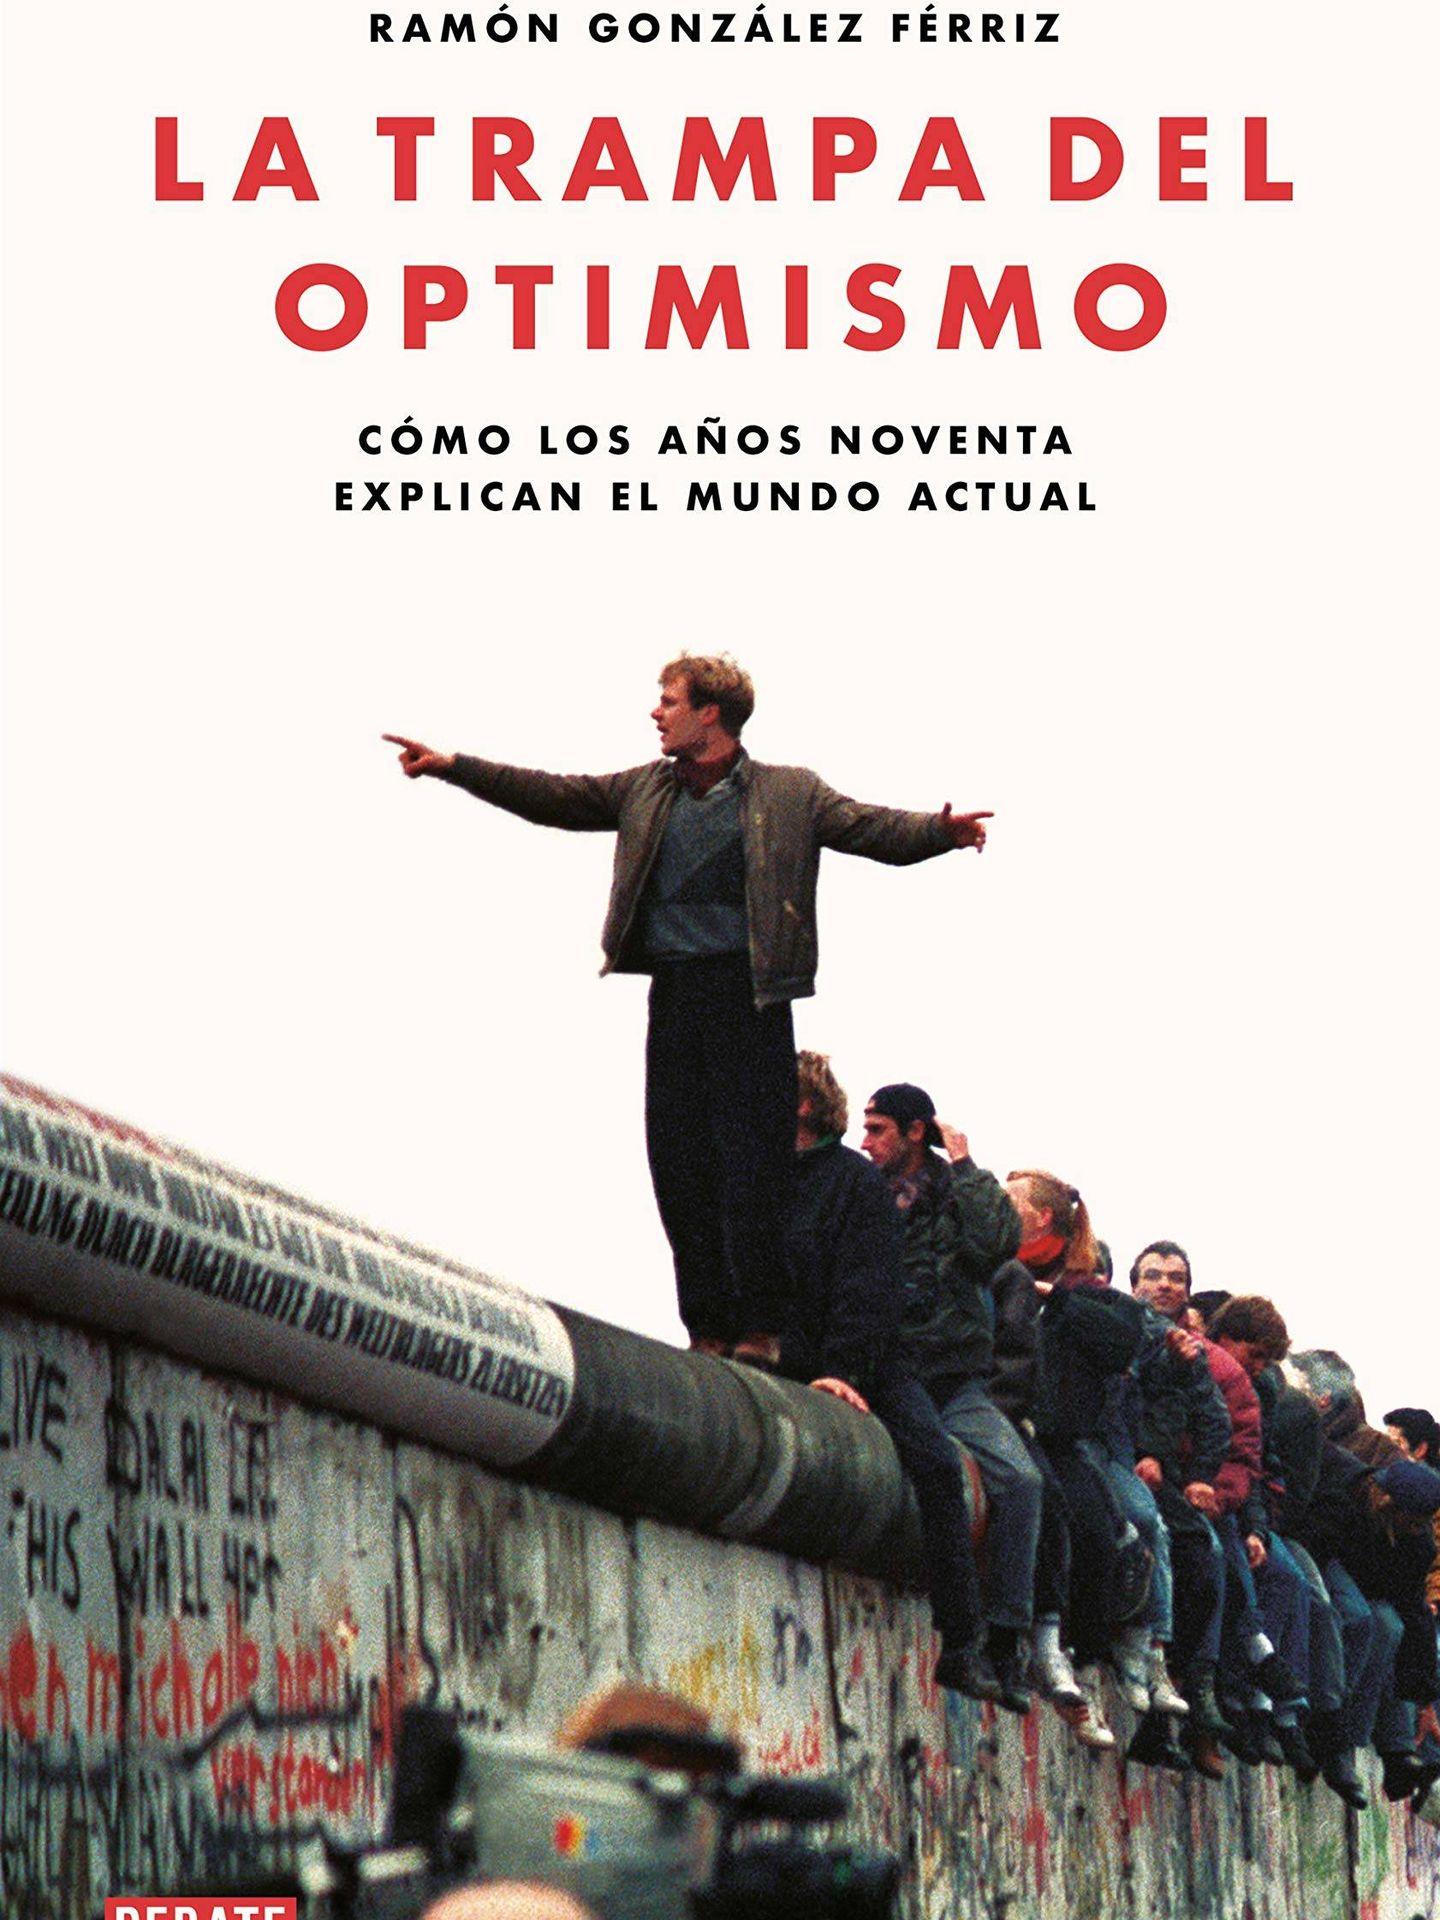 'La trampa del optimismo' (Debate).